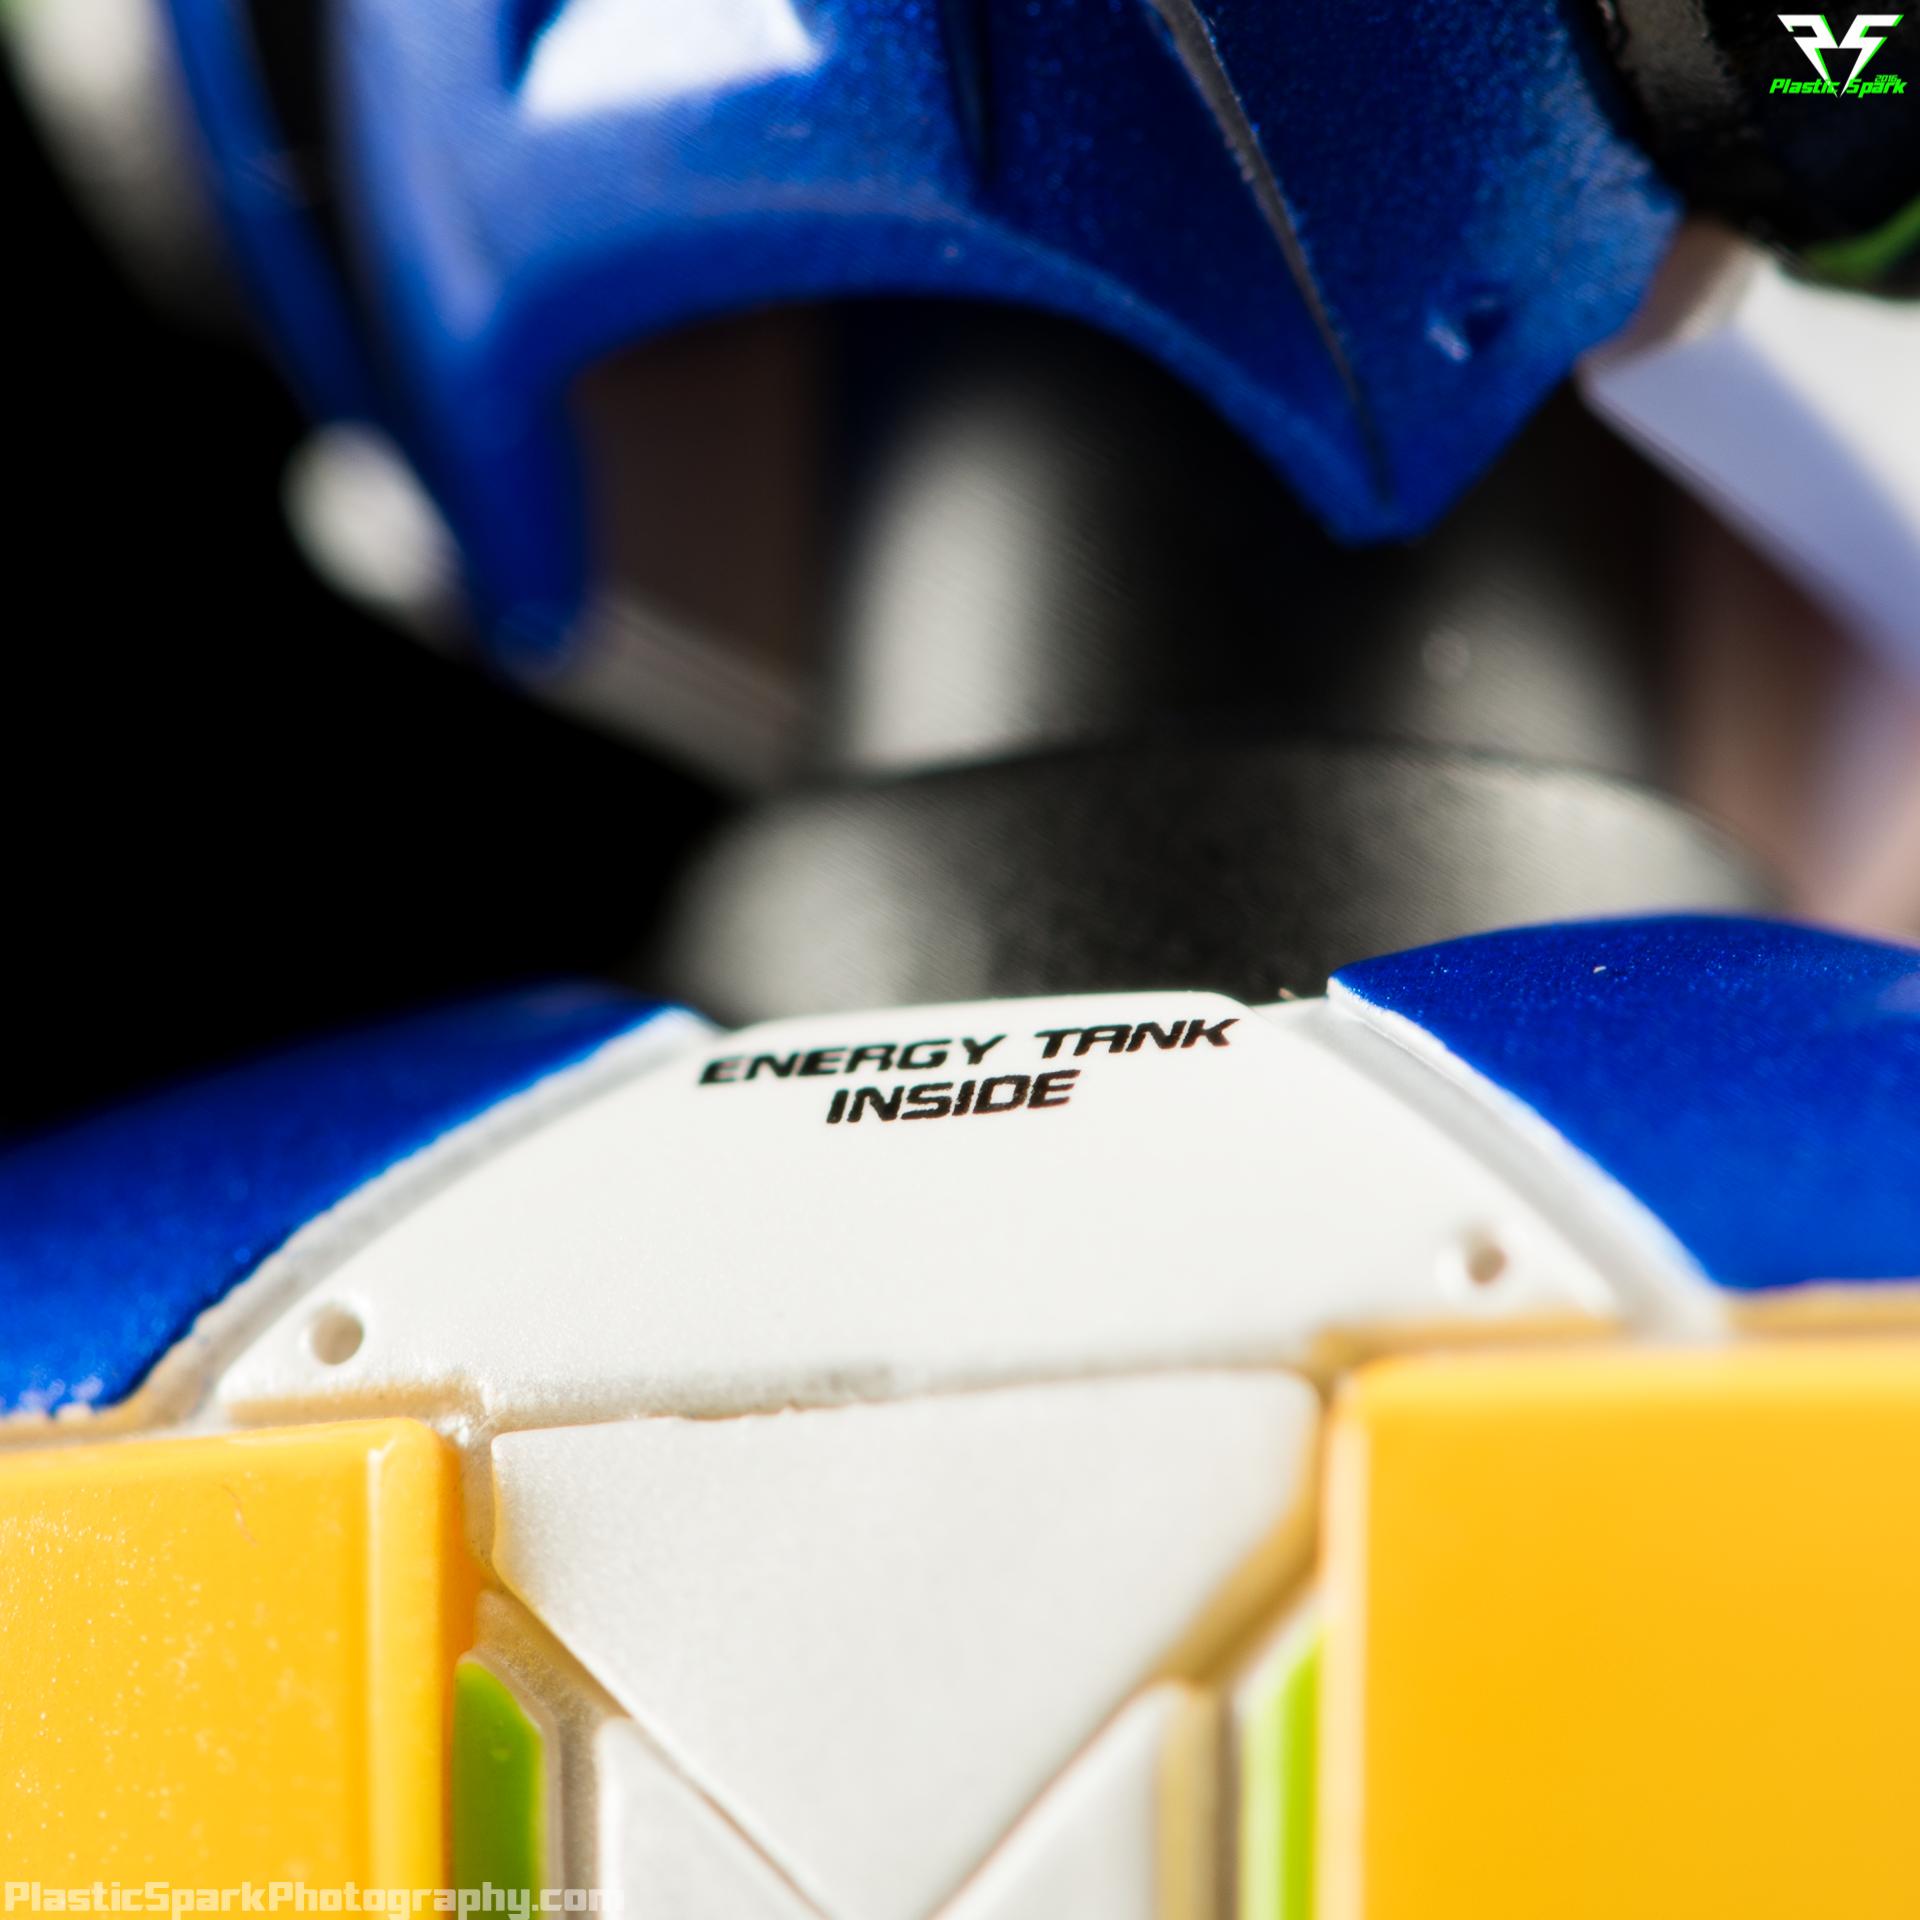 Truforce-Megaman-X-Boost-(Details)-(11-of-15).png